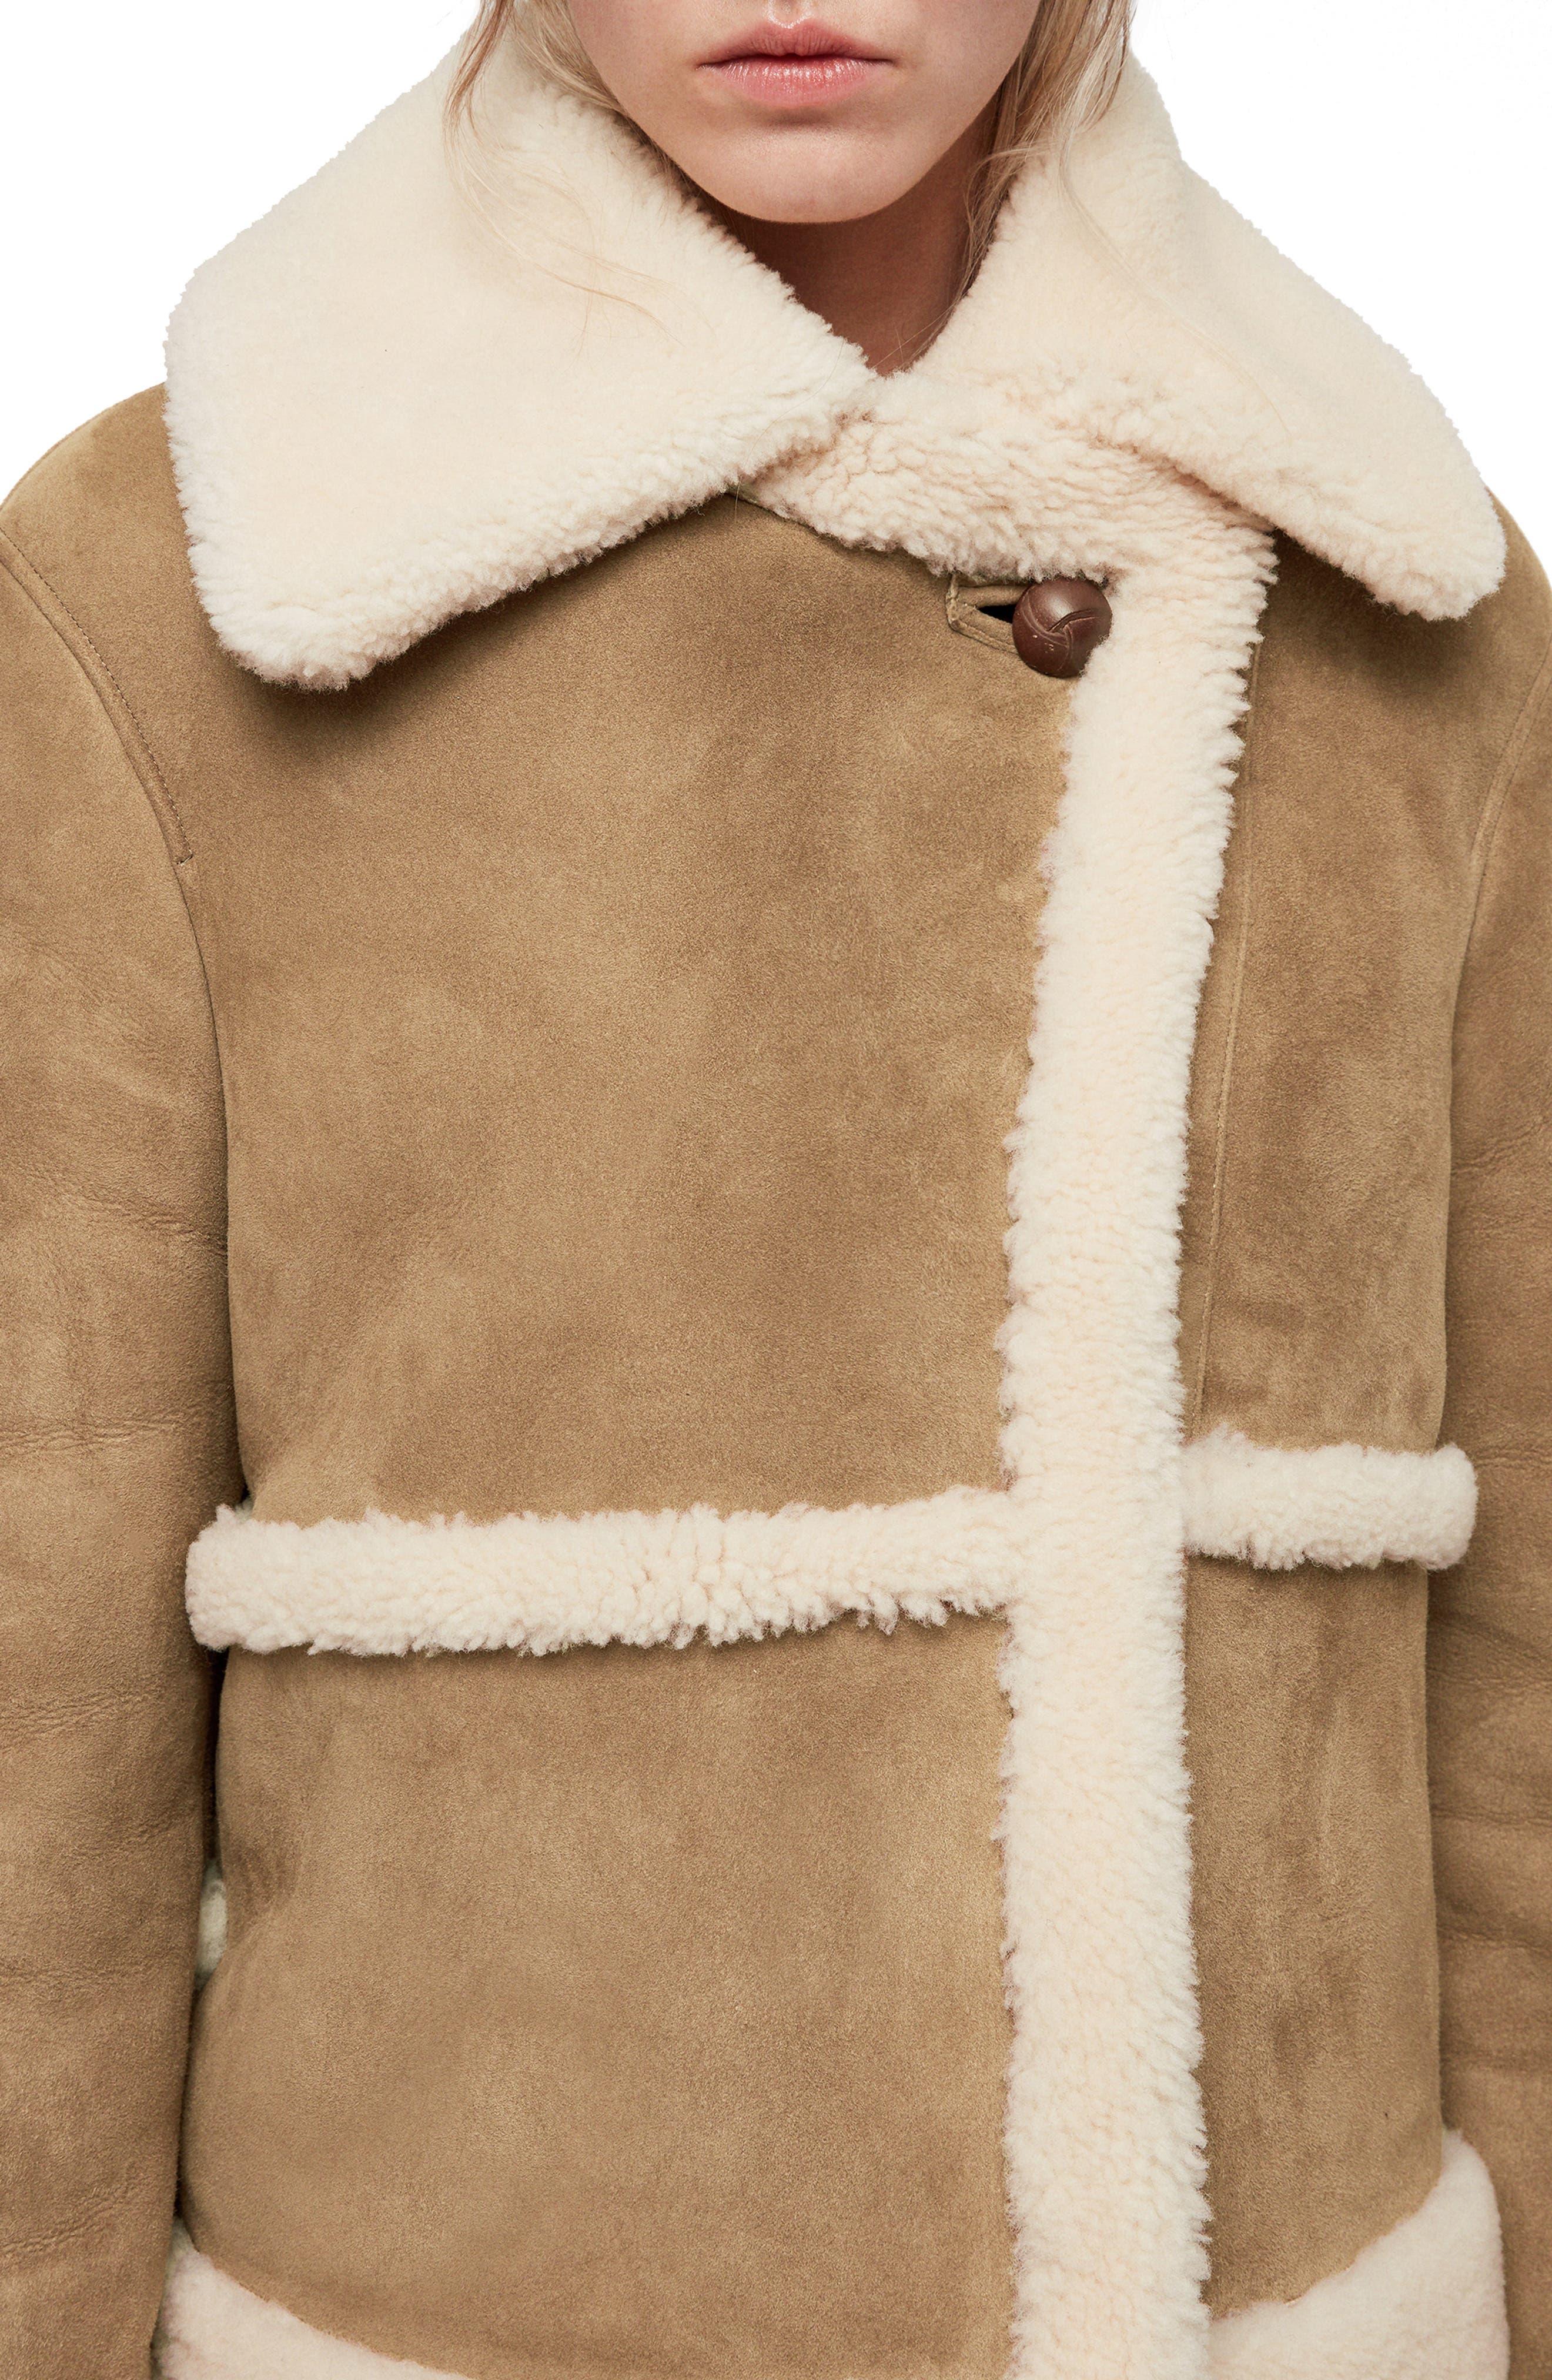 Farley Genuine Shearling Jacket,                             Alternate thumbnail 3, color,                             SAND BROWN/ ECRU